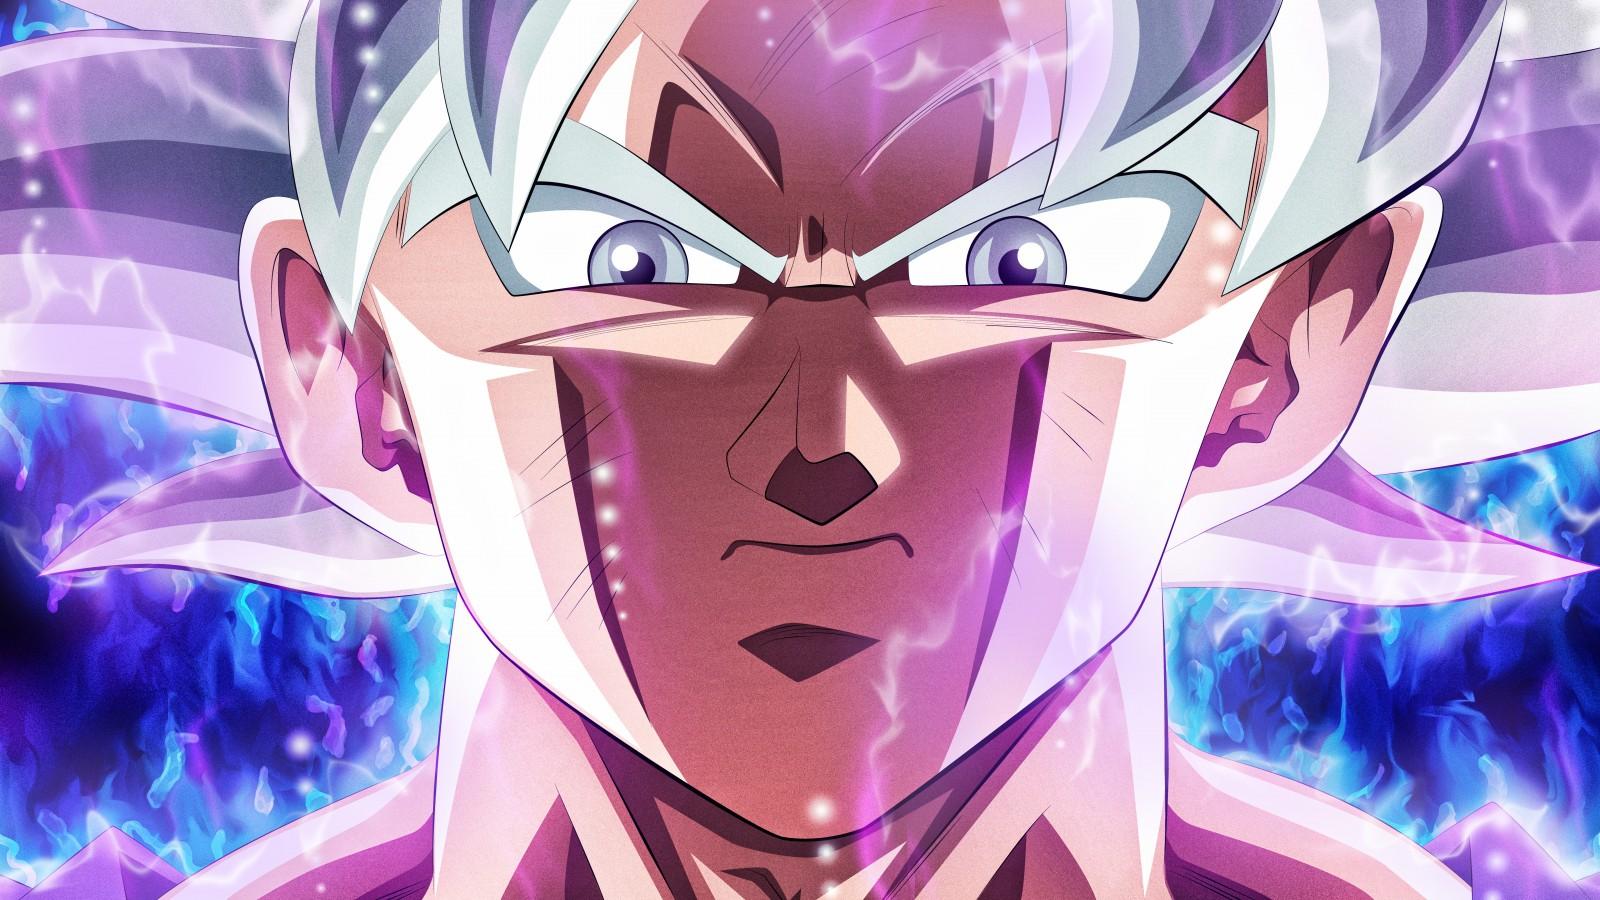 Anime Sword Wallpaper Goku Ultra Instinct 4k 8k Wallpapers Hd Wallpapers Id